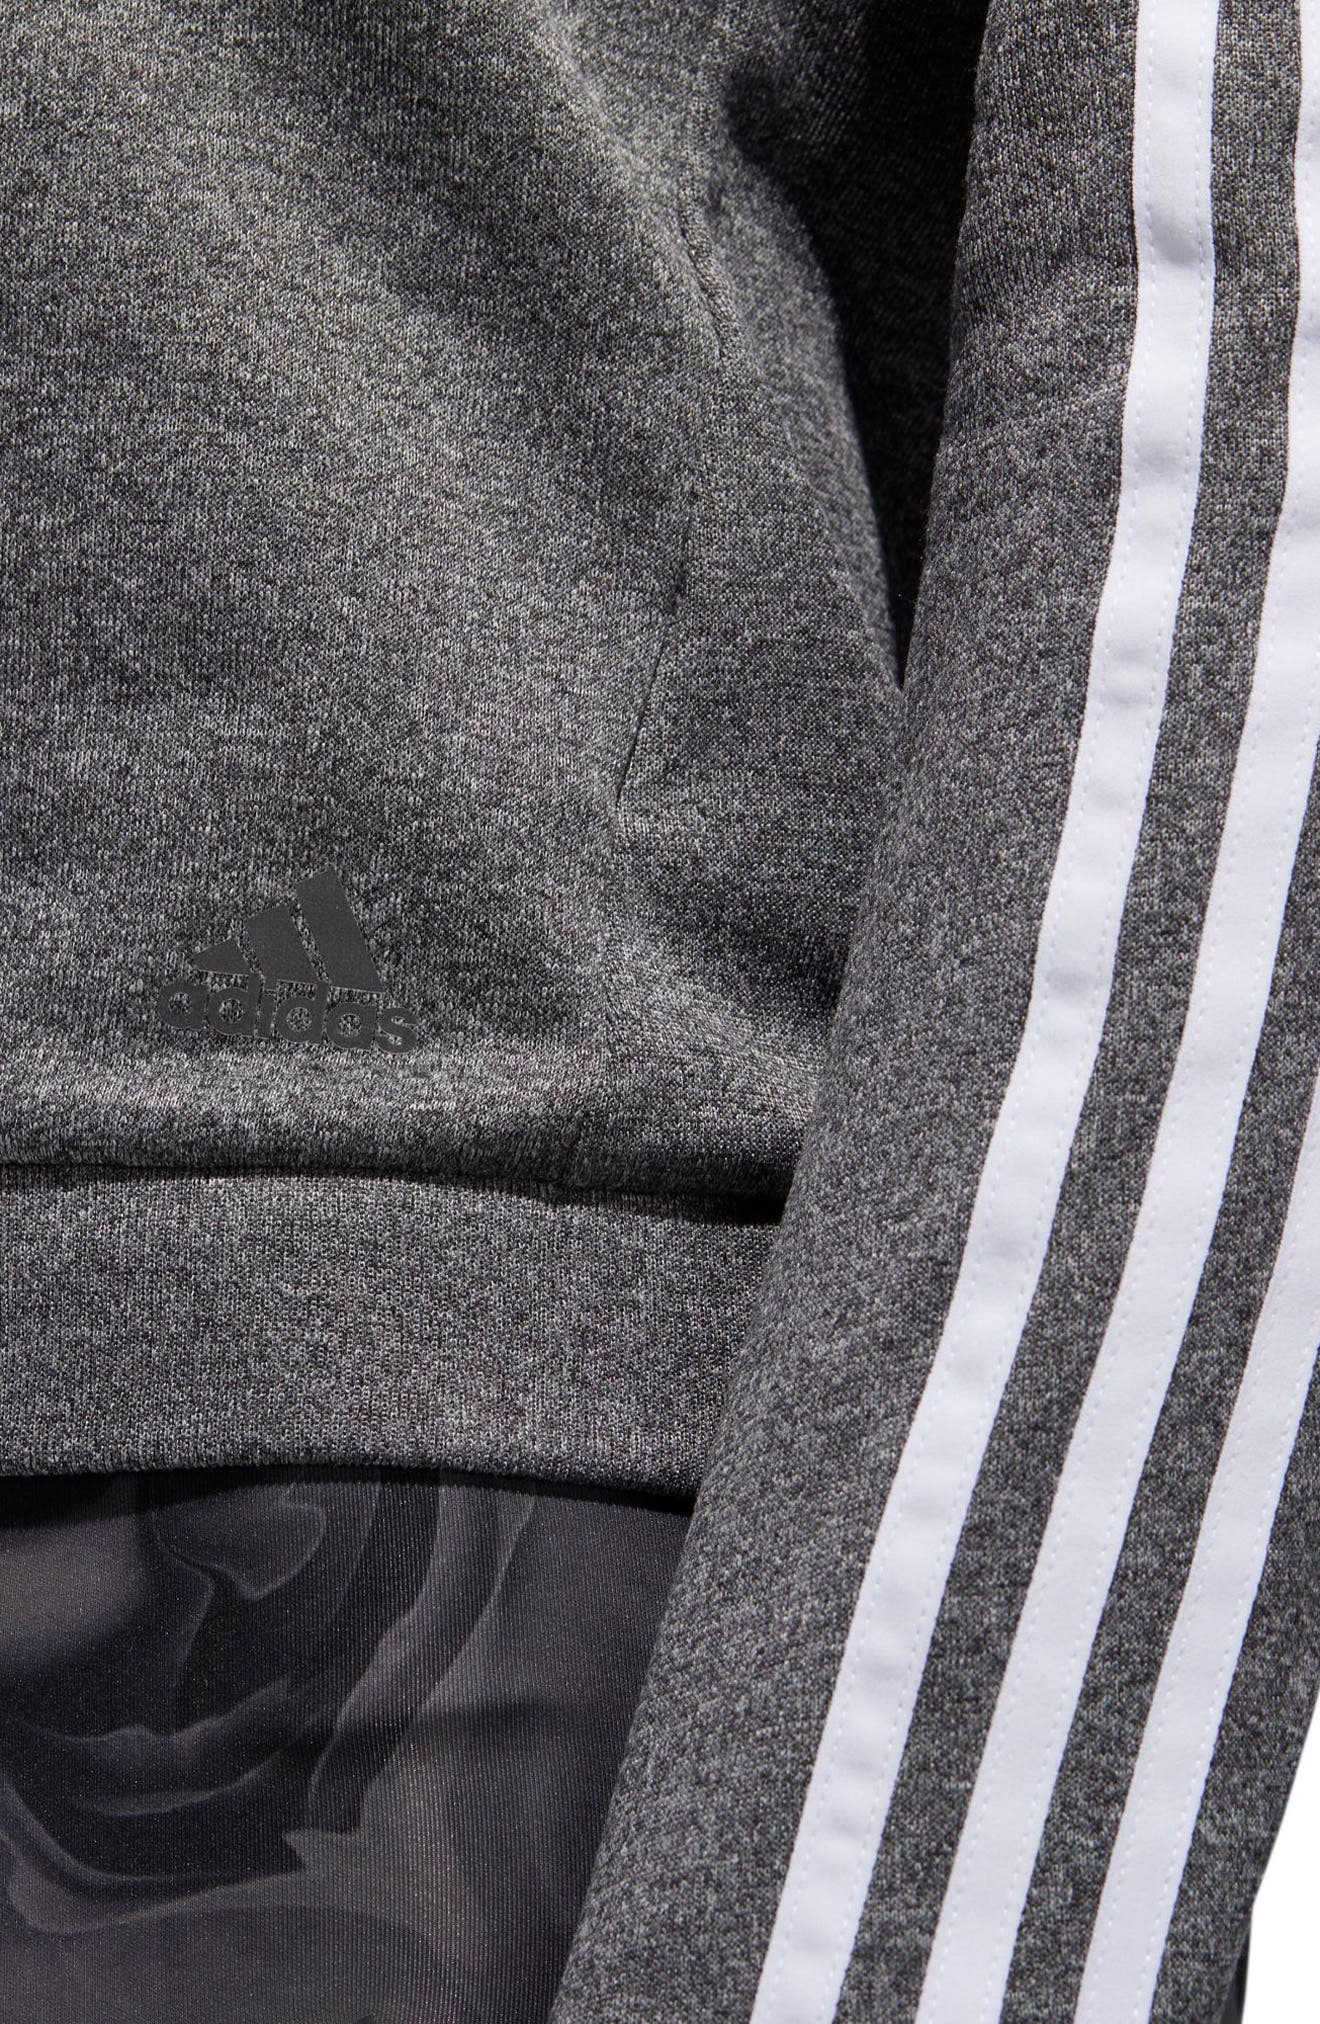 3-Stripes Running Sweatshirt,                             Alternate thumbnail 8, color,                             DARK GREY HEATHER